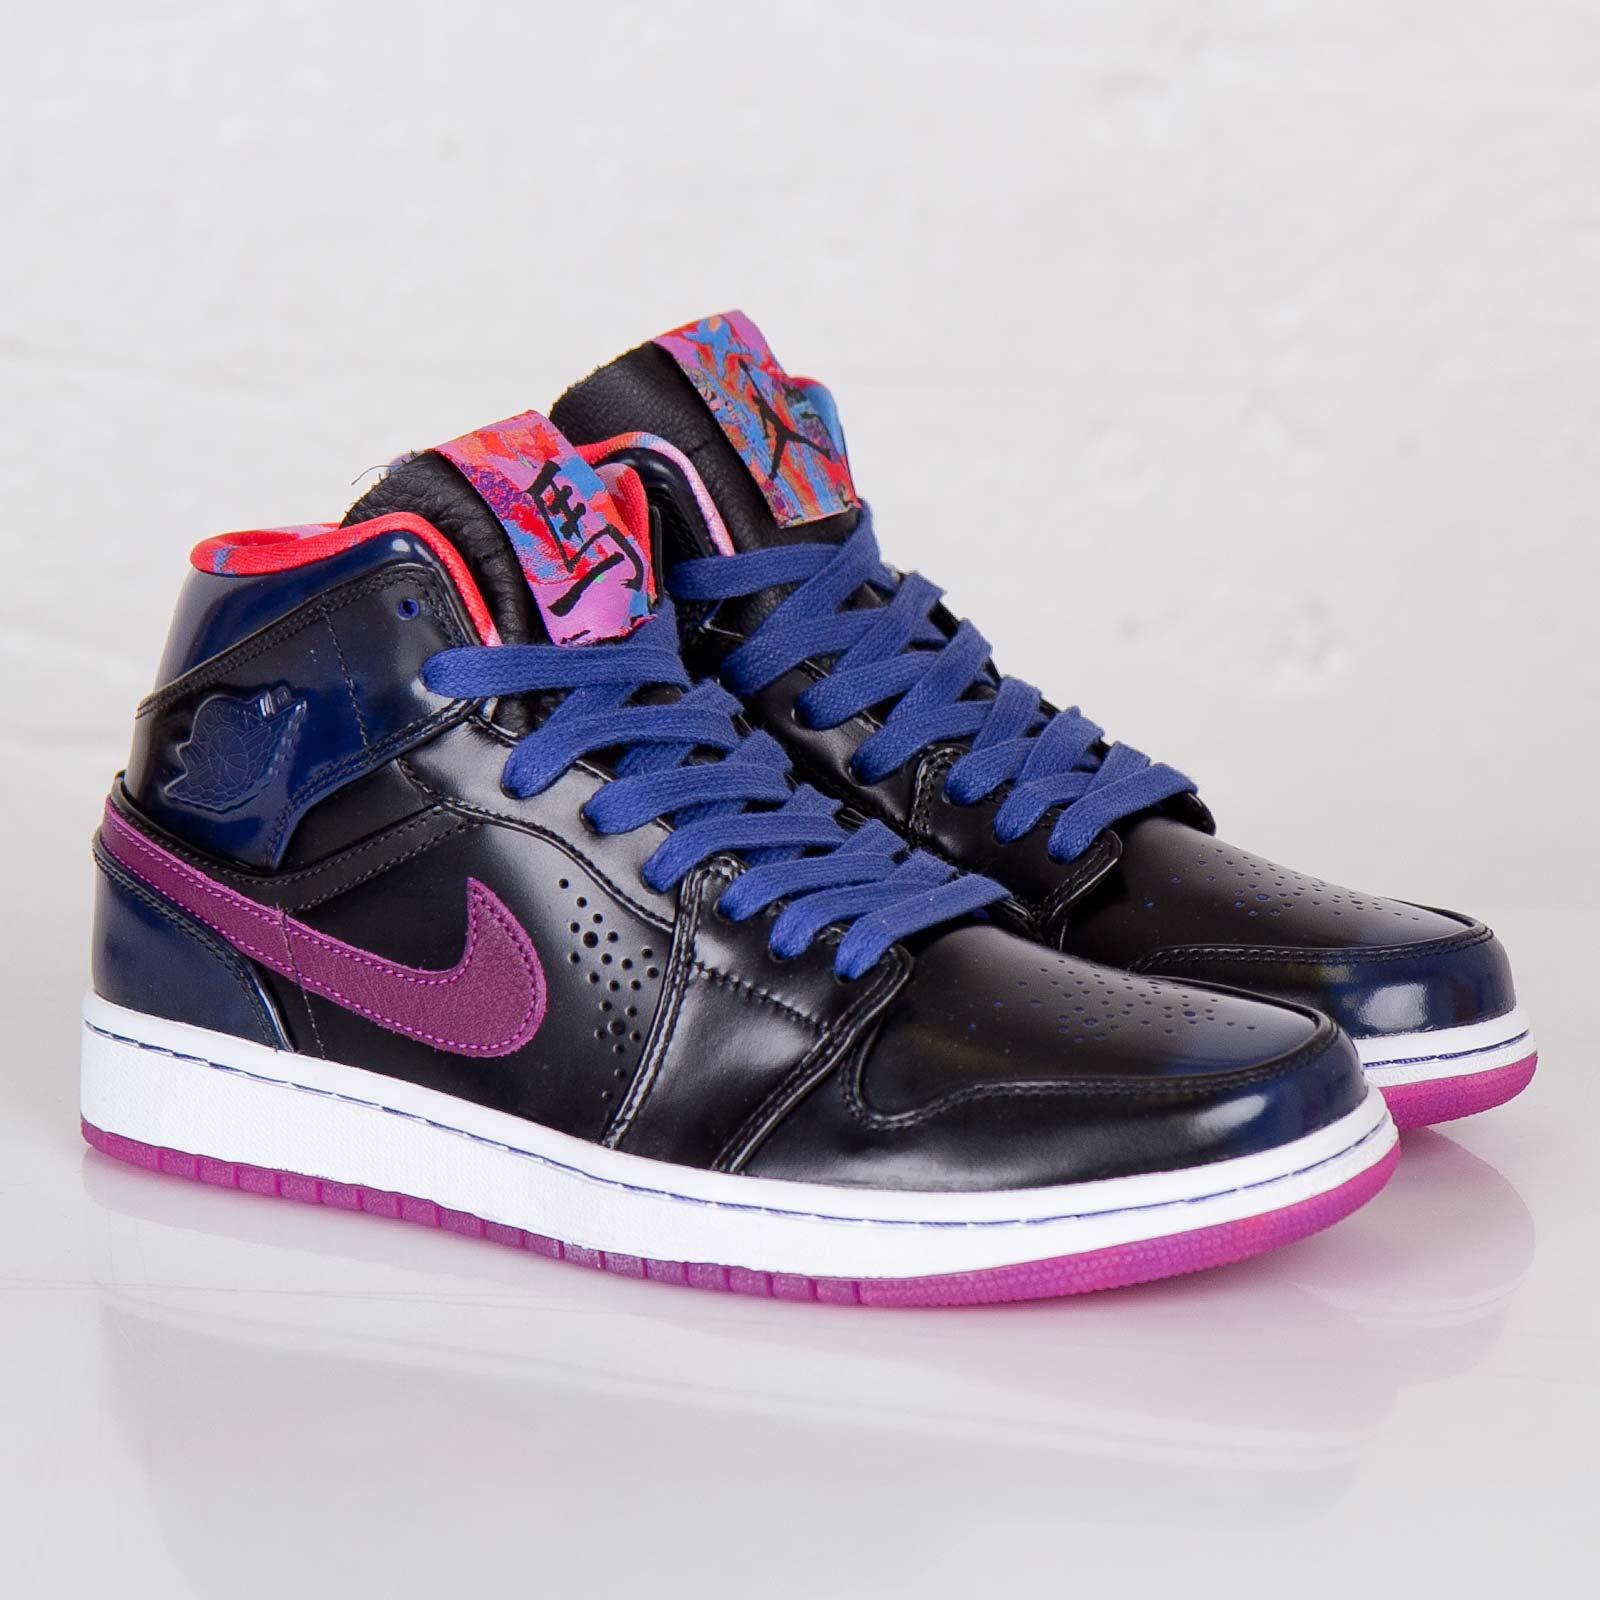 Jordan Brand Air Jordan 1 Mid Nouveau YOTH - 652484-405 - SNS ...